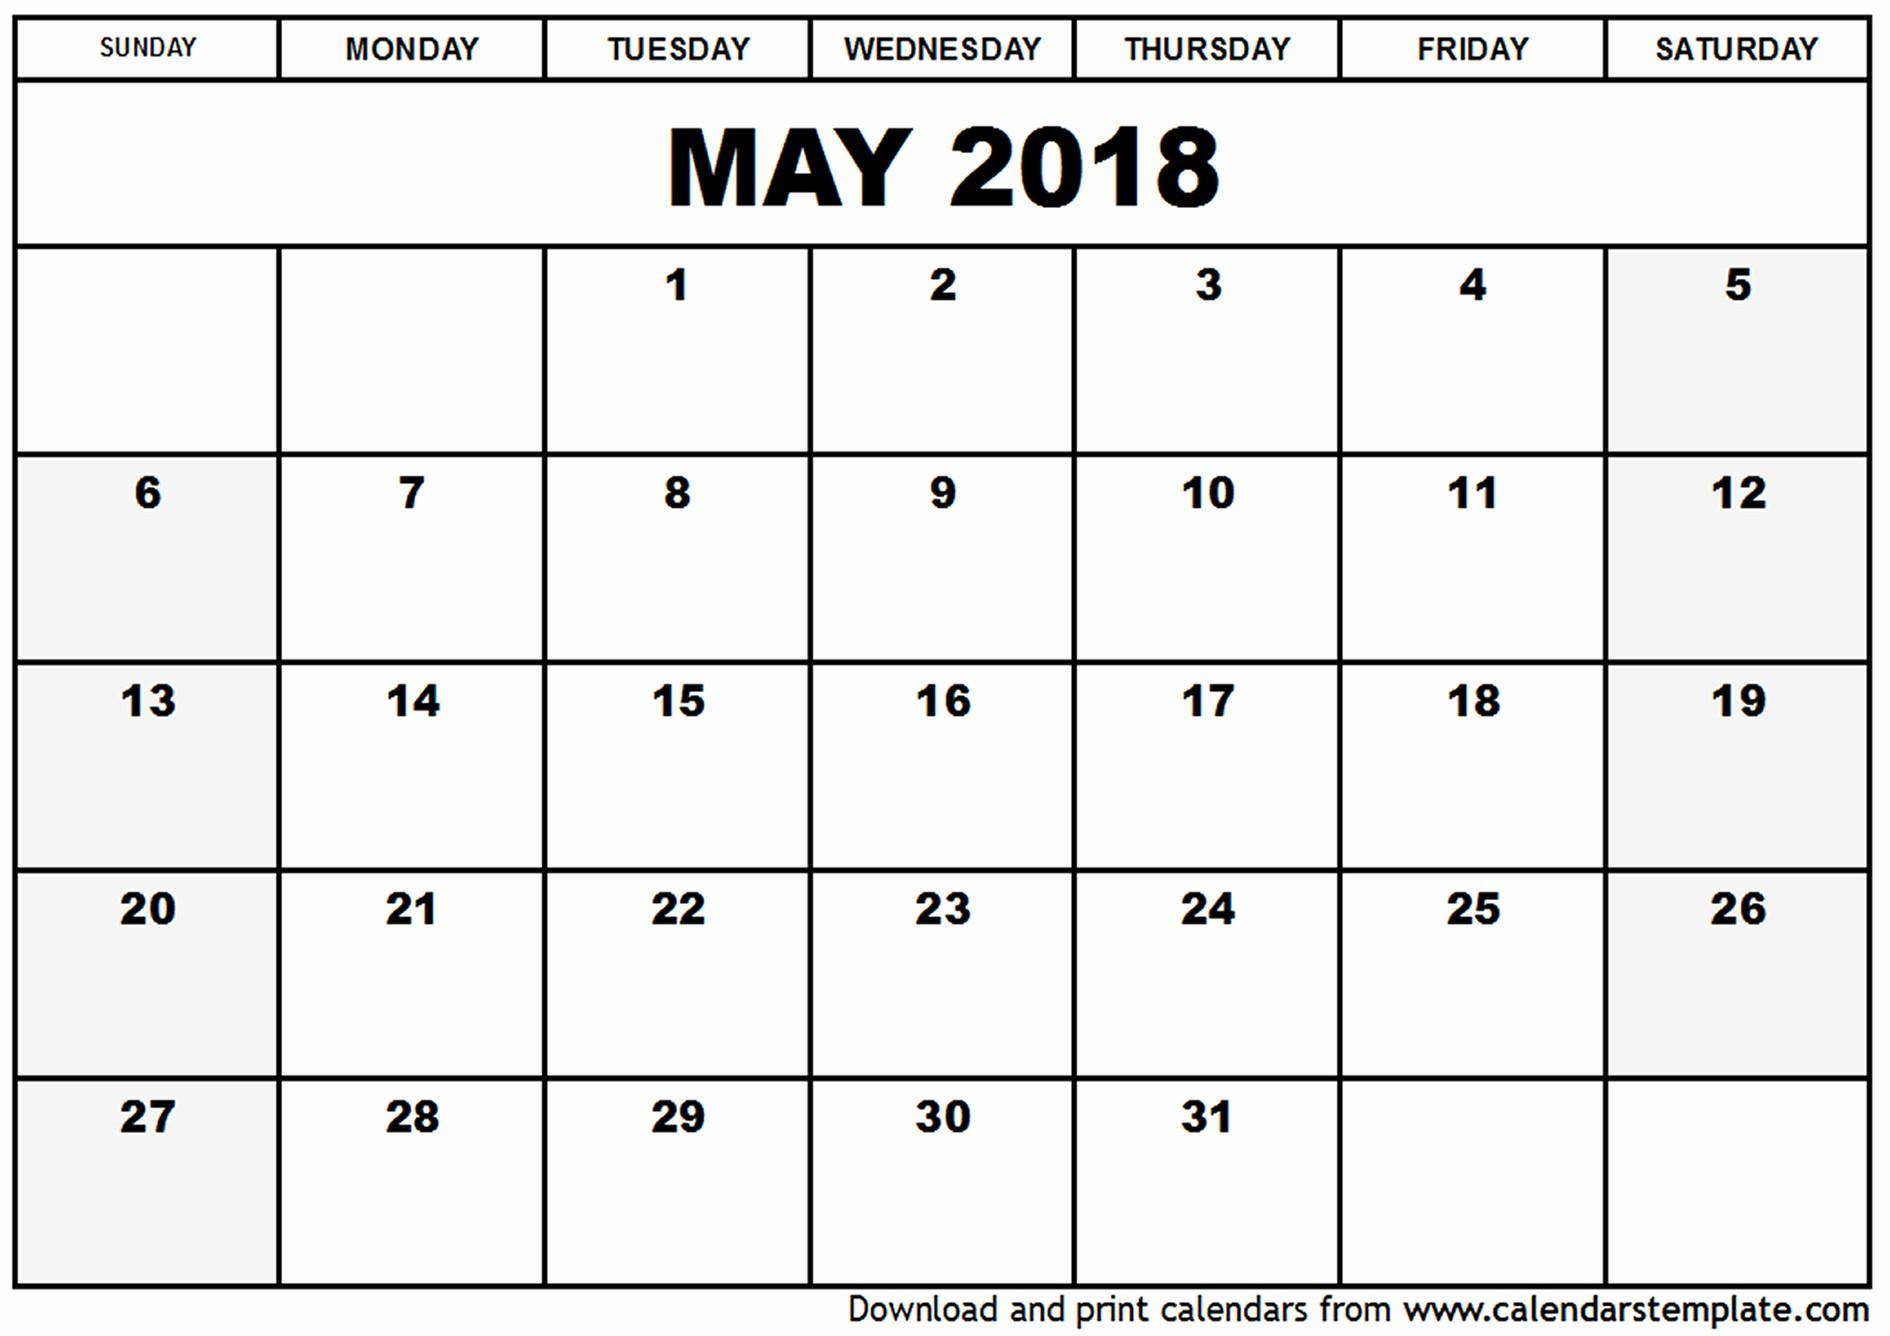 Free May 2018 Calendar Template Fresh May 2018 Calendar Template